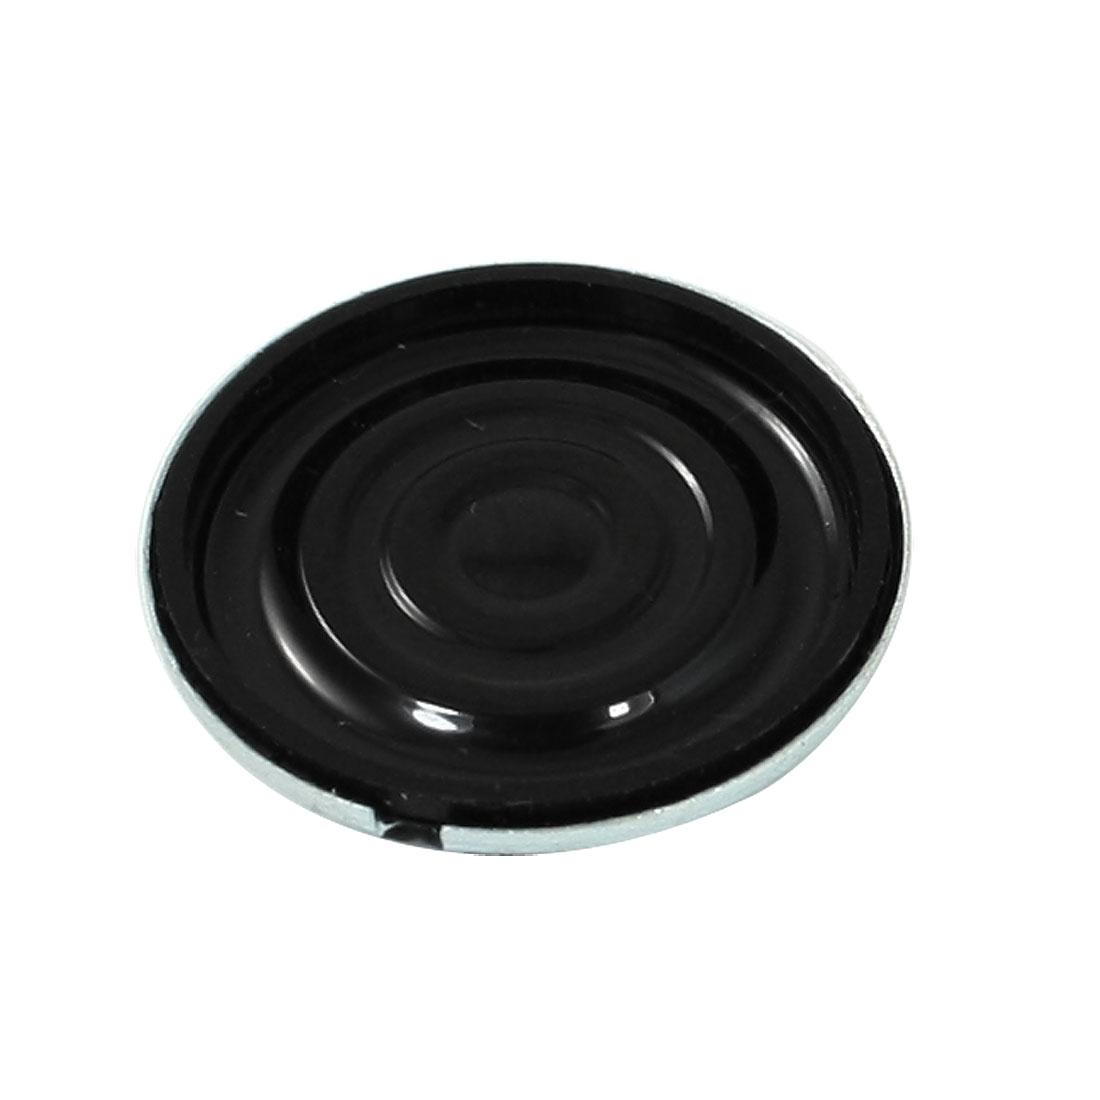 1W 8 Ohm Magentic Type Round Metal Shell Speaker Horn 20mm Diameter